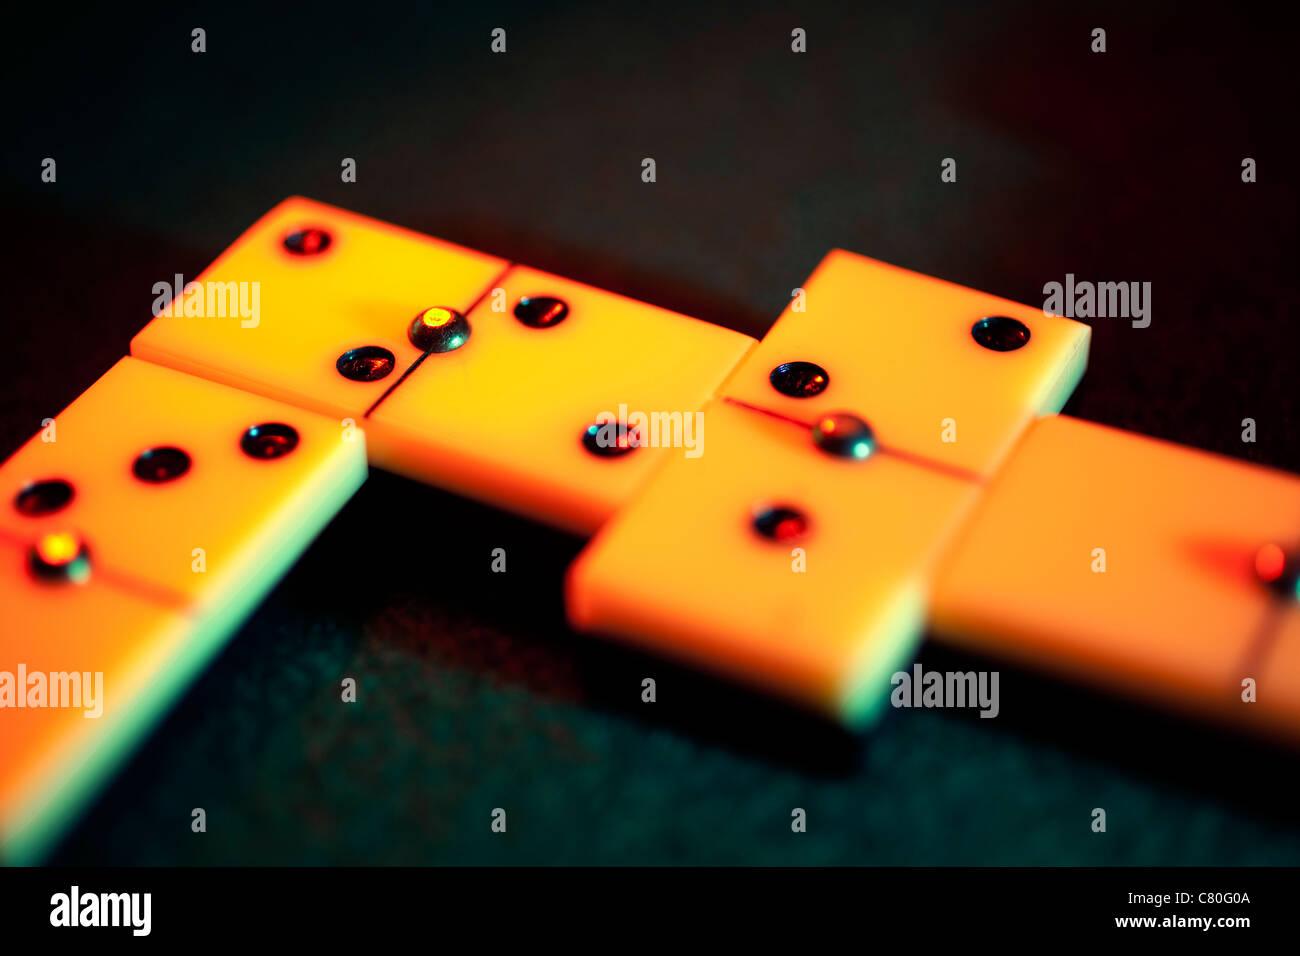 Domino game - Stock Image